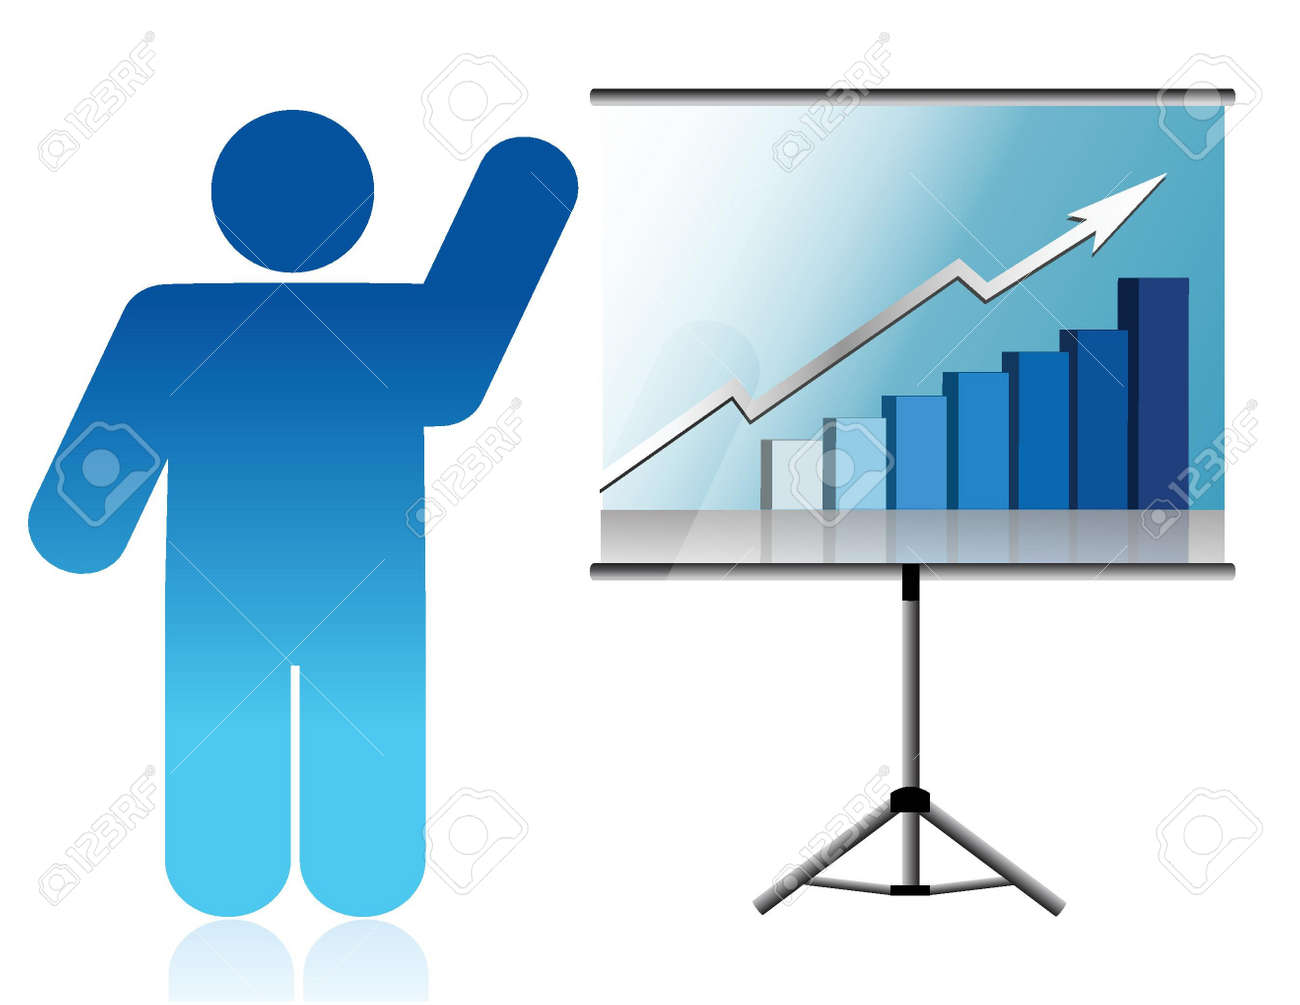 presentation under way illustration design over white background Stock Vector - 15829617